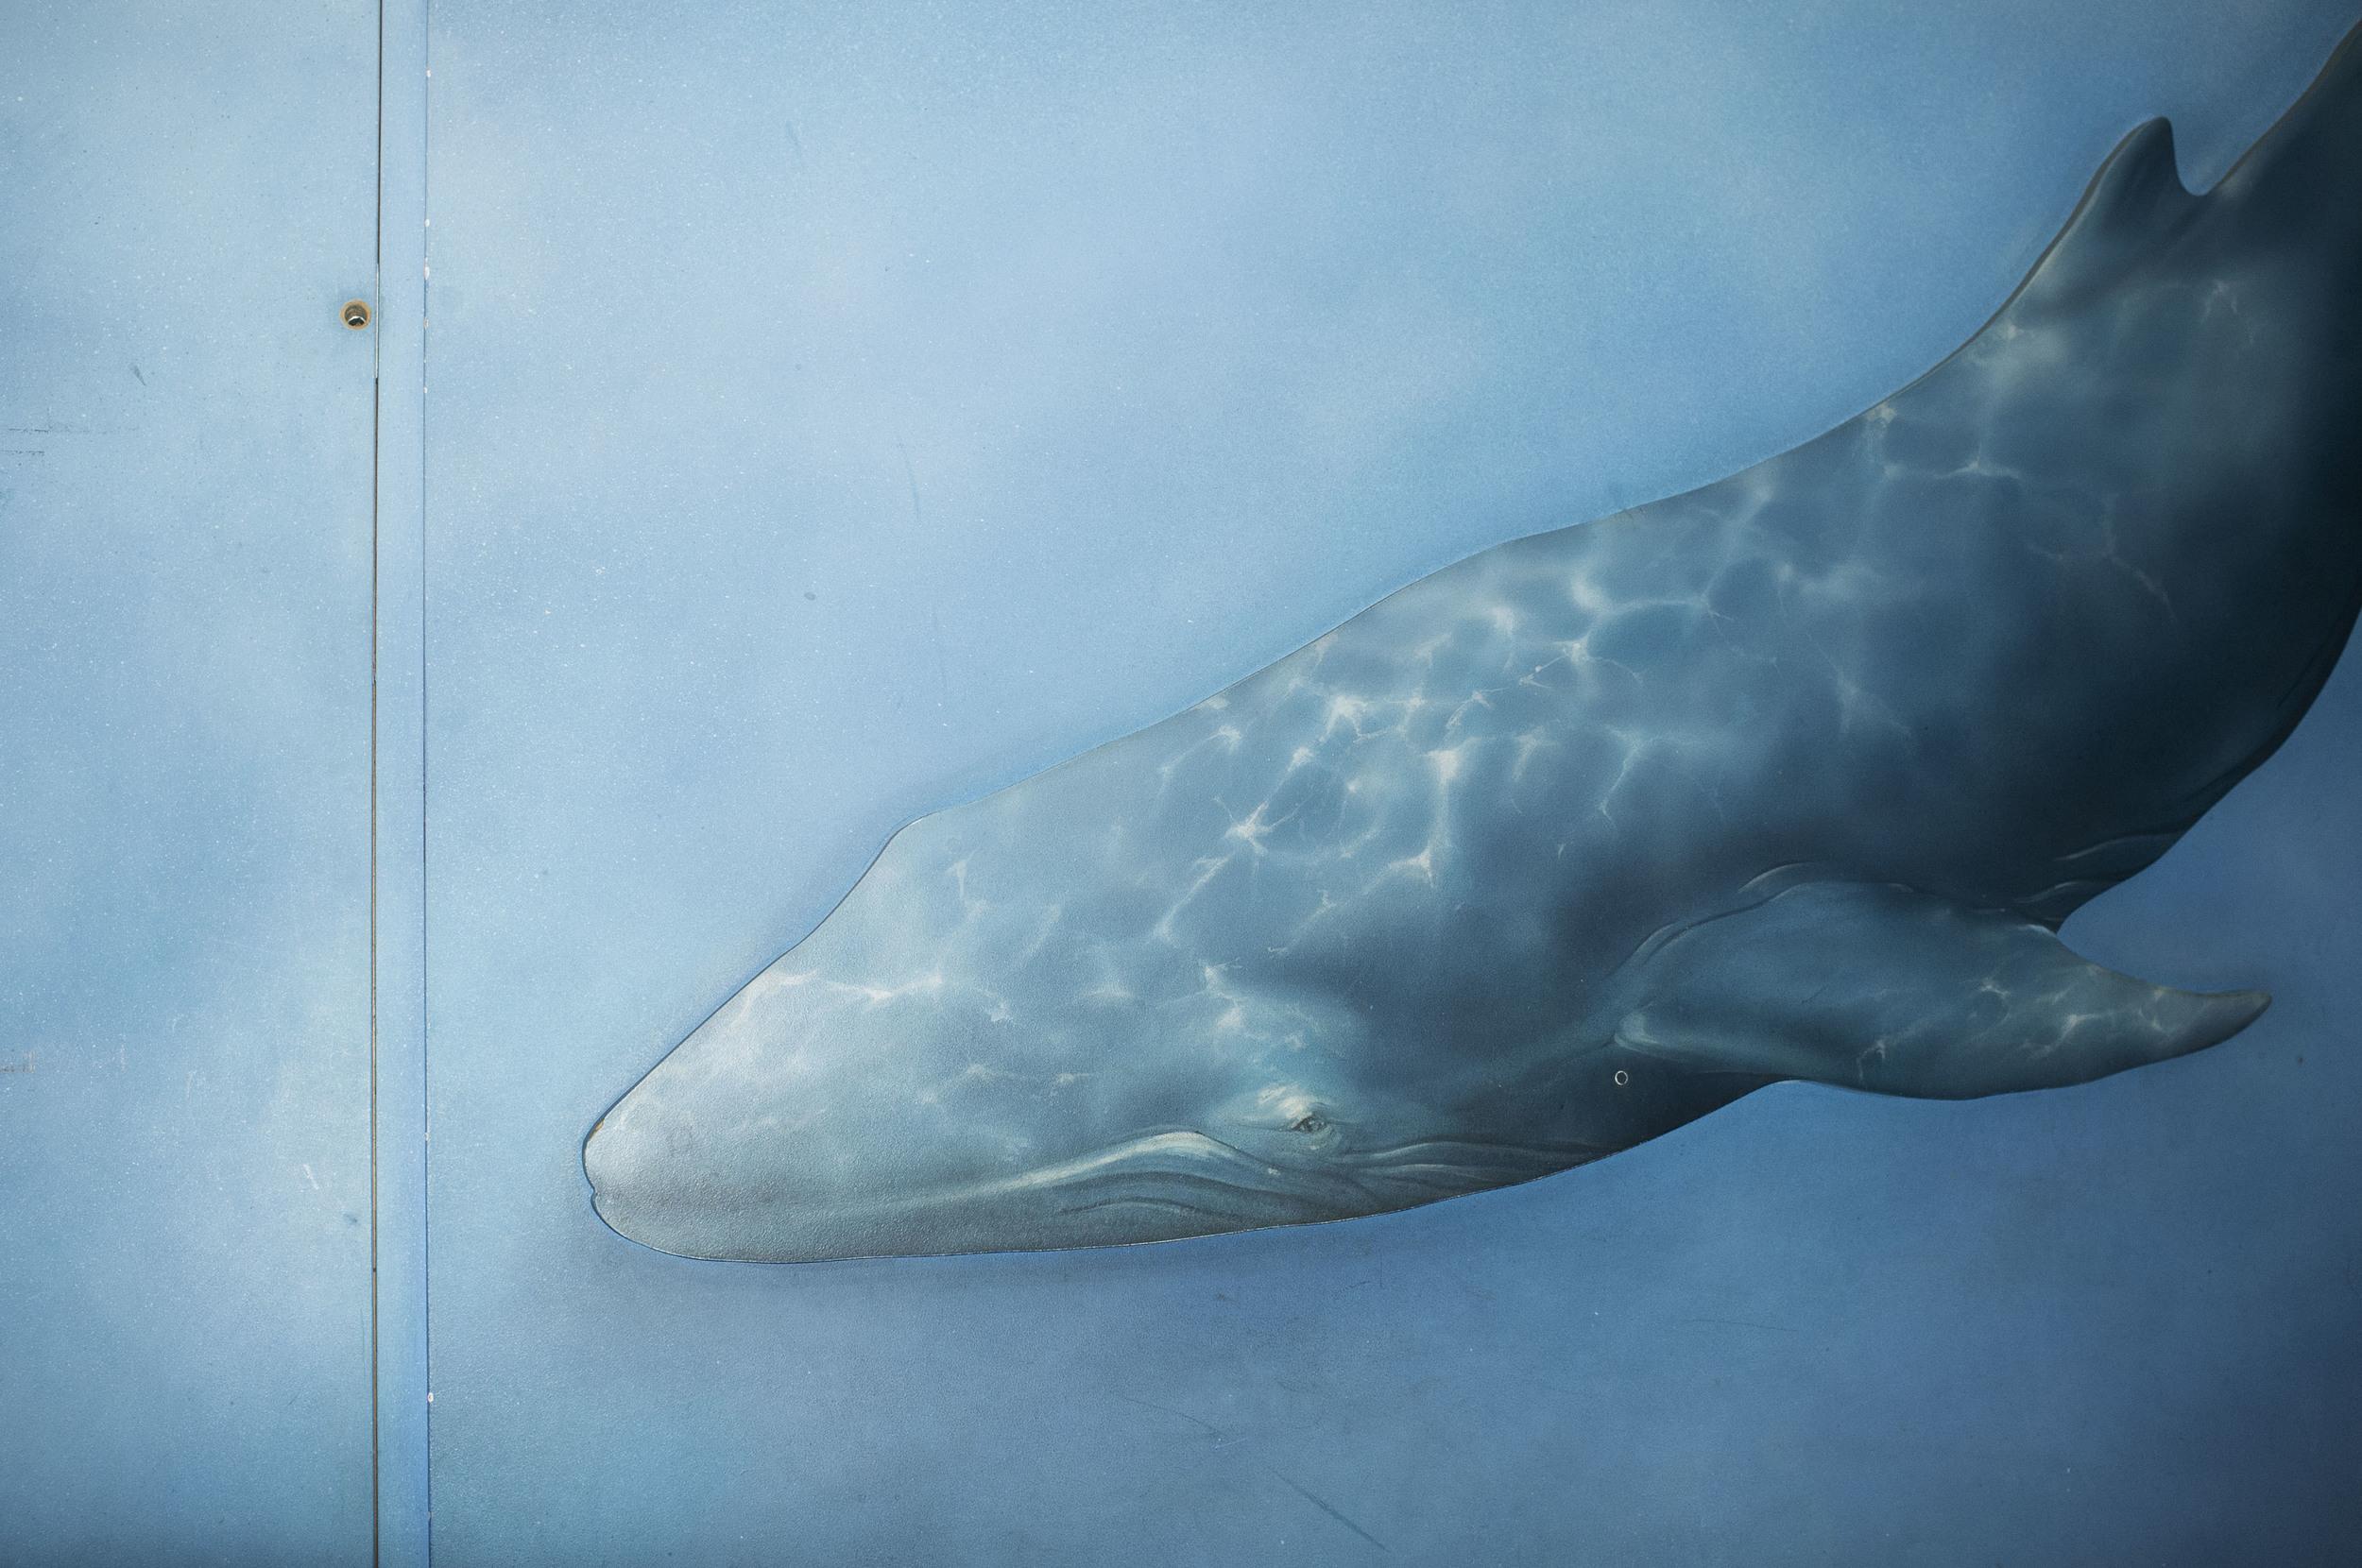 Whale light_DSCF3905_PRINT.jpg